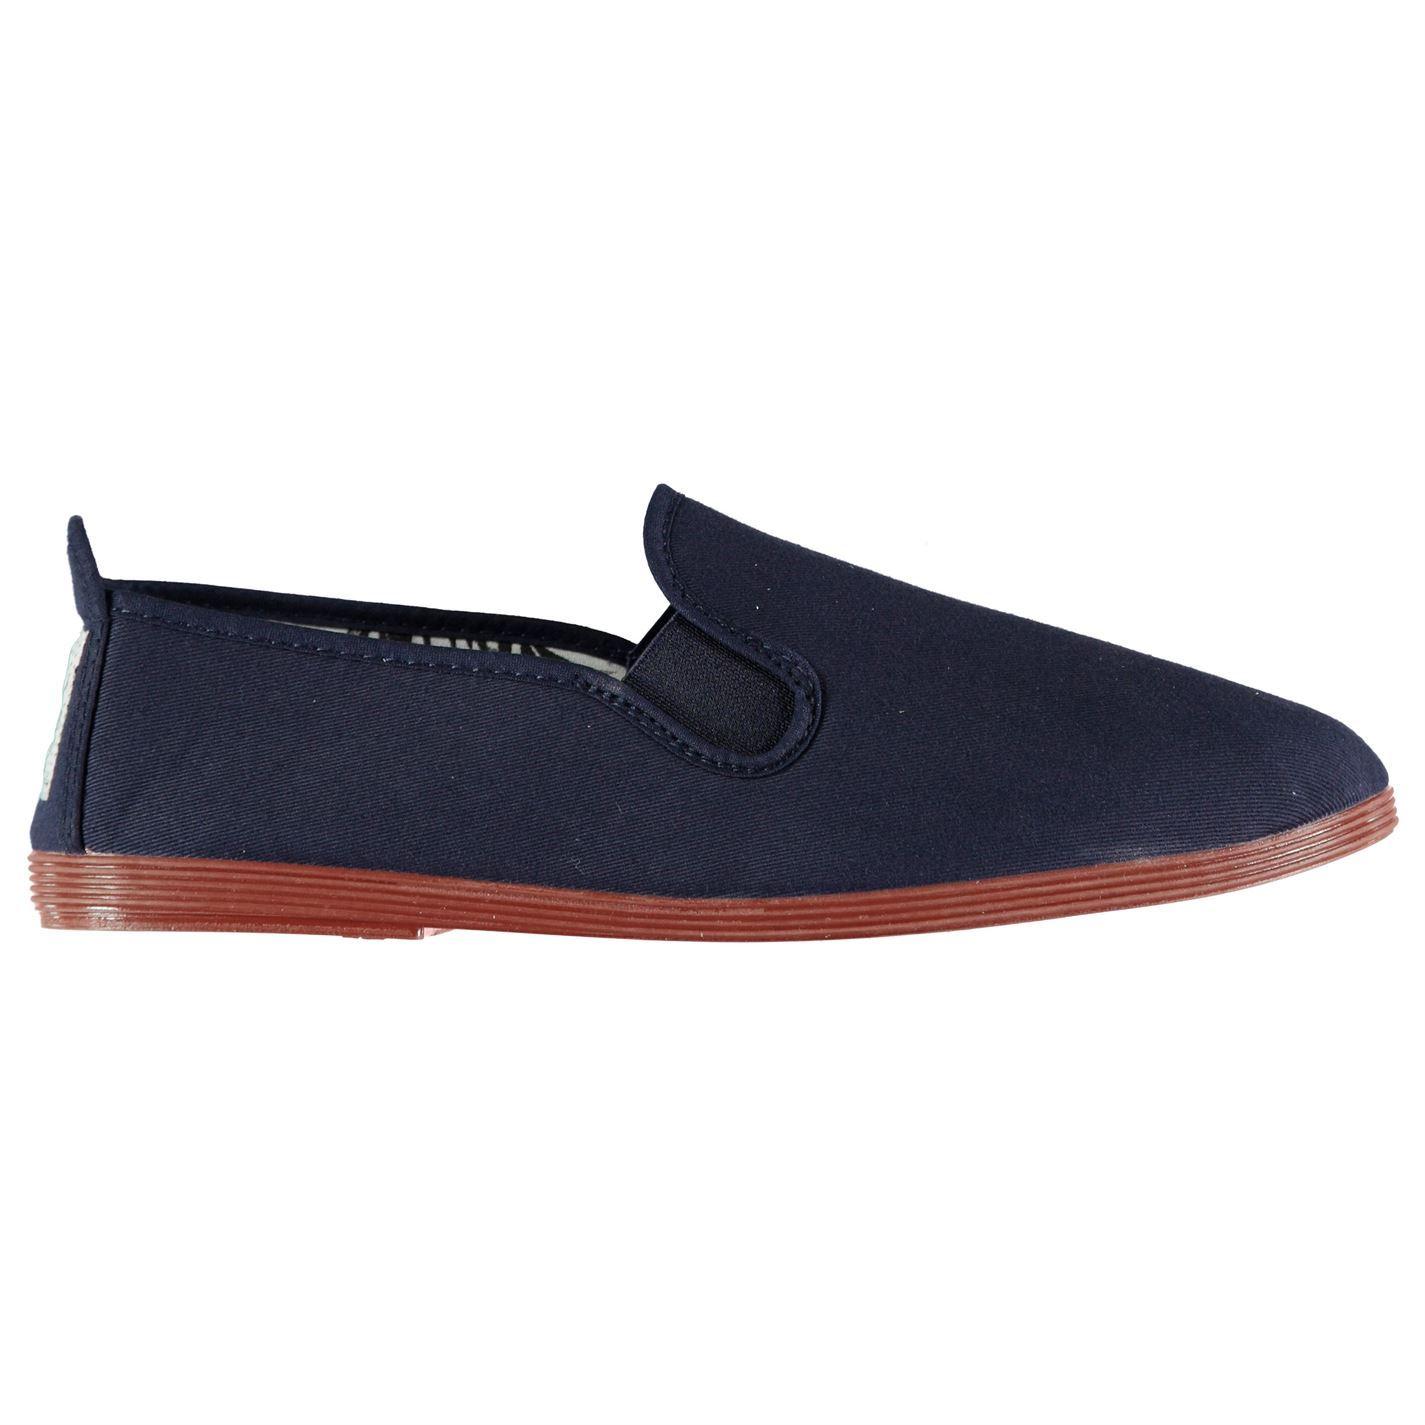 Scarpe da Shoes On Slip ginnastica da Flossy uomo Arendo g7WzIp